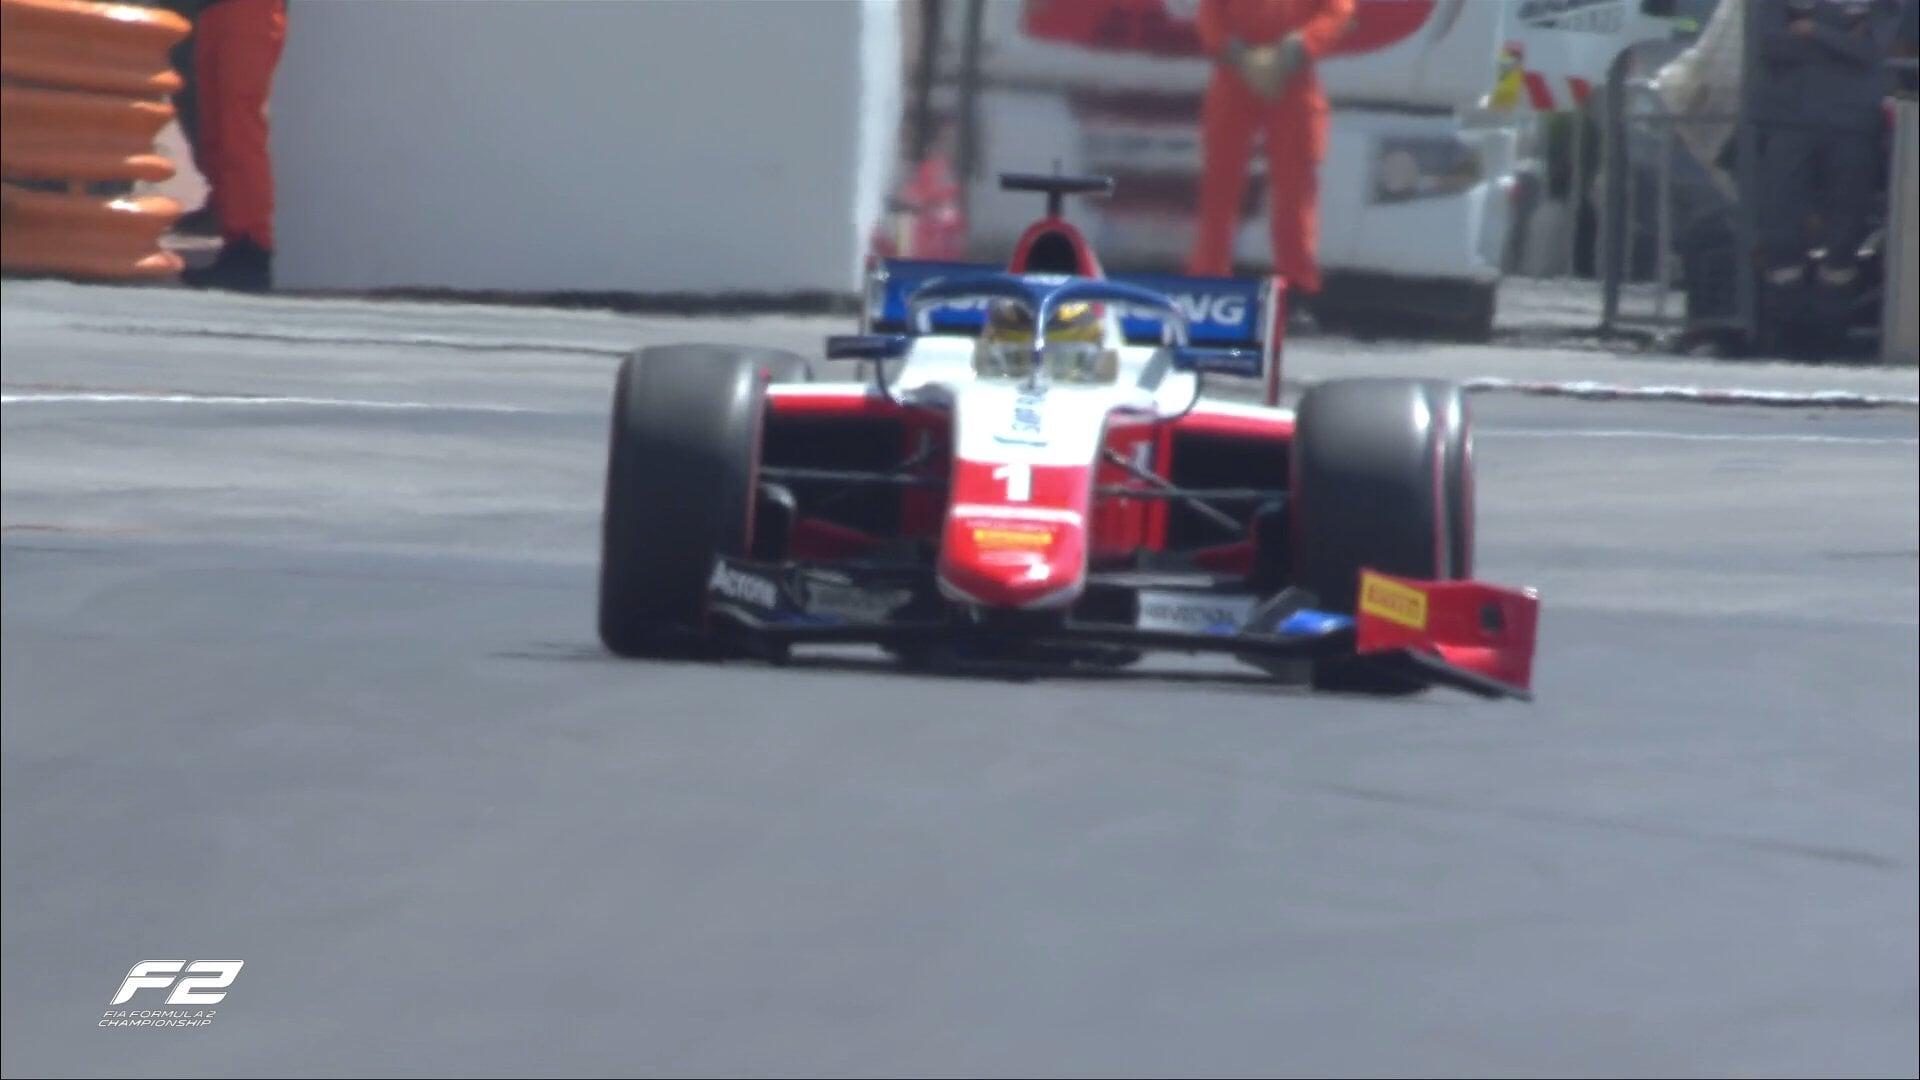 Формула-2. Шварцман сошел после аварии на первом круге 1-й гонки в Монако